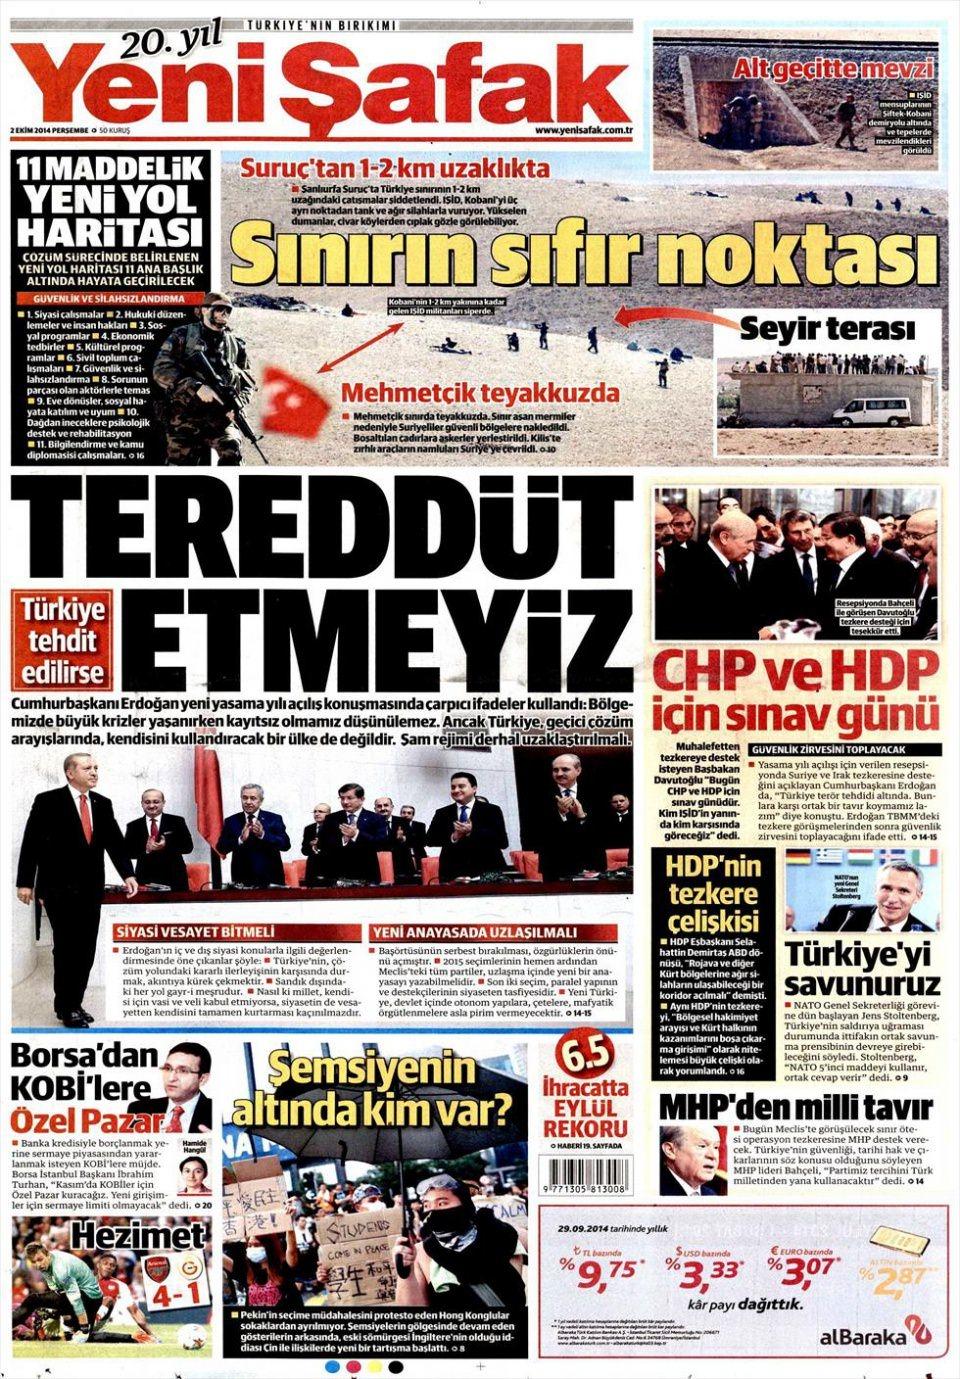 2 Ekim 2014 gazete manşetleri 25